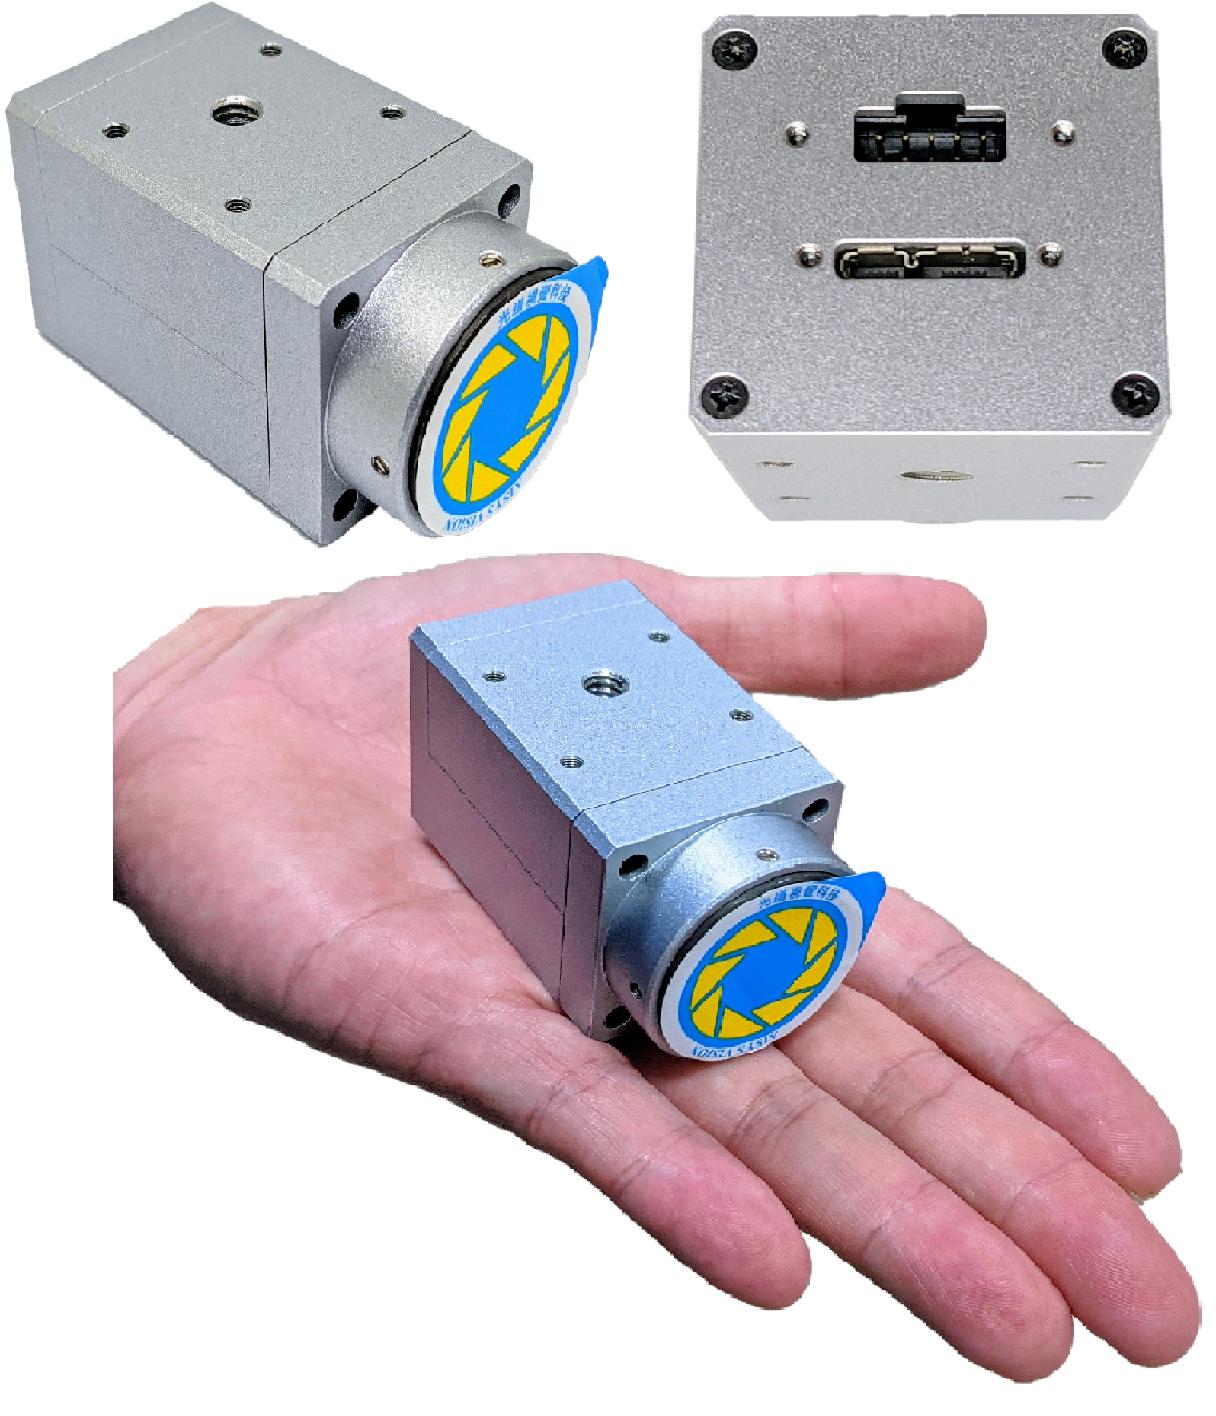 CYCLOPS SU1000C-8攝影機-10.0M像素、內同步式、彩色、內建LED燈源控制器